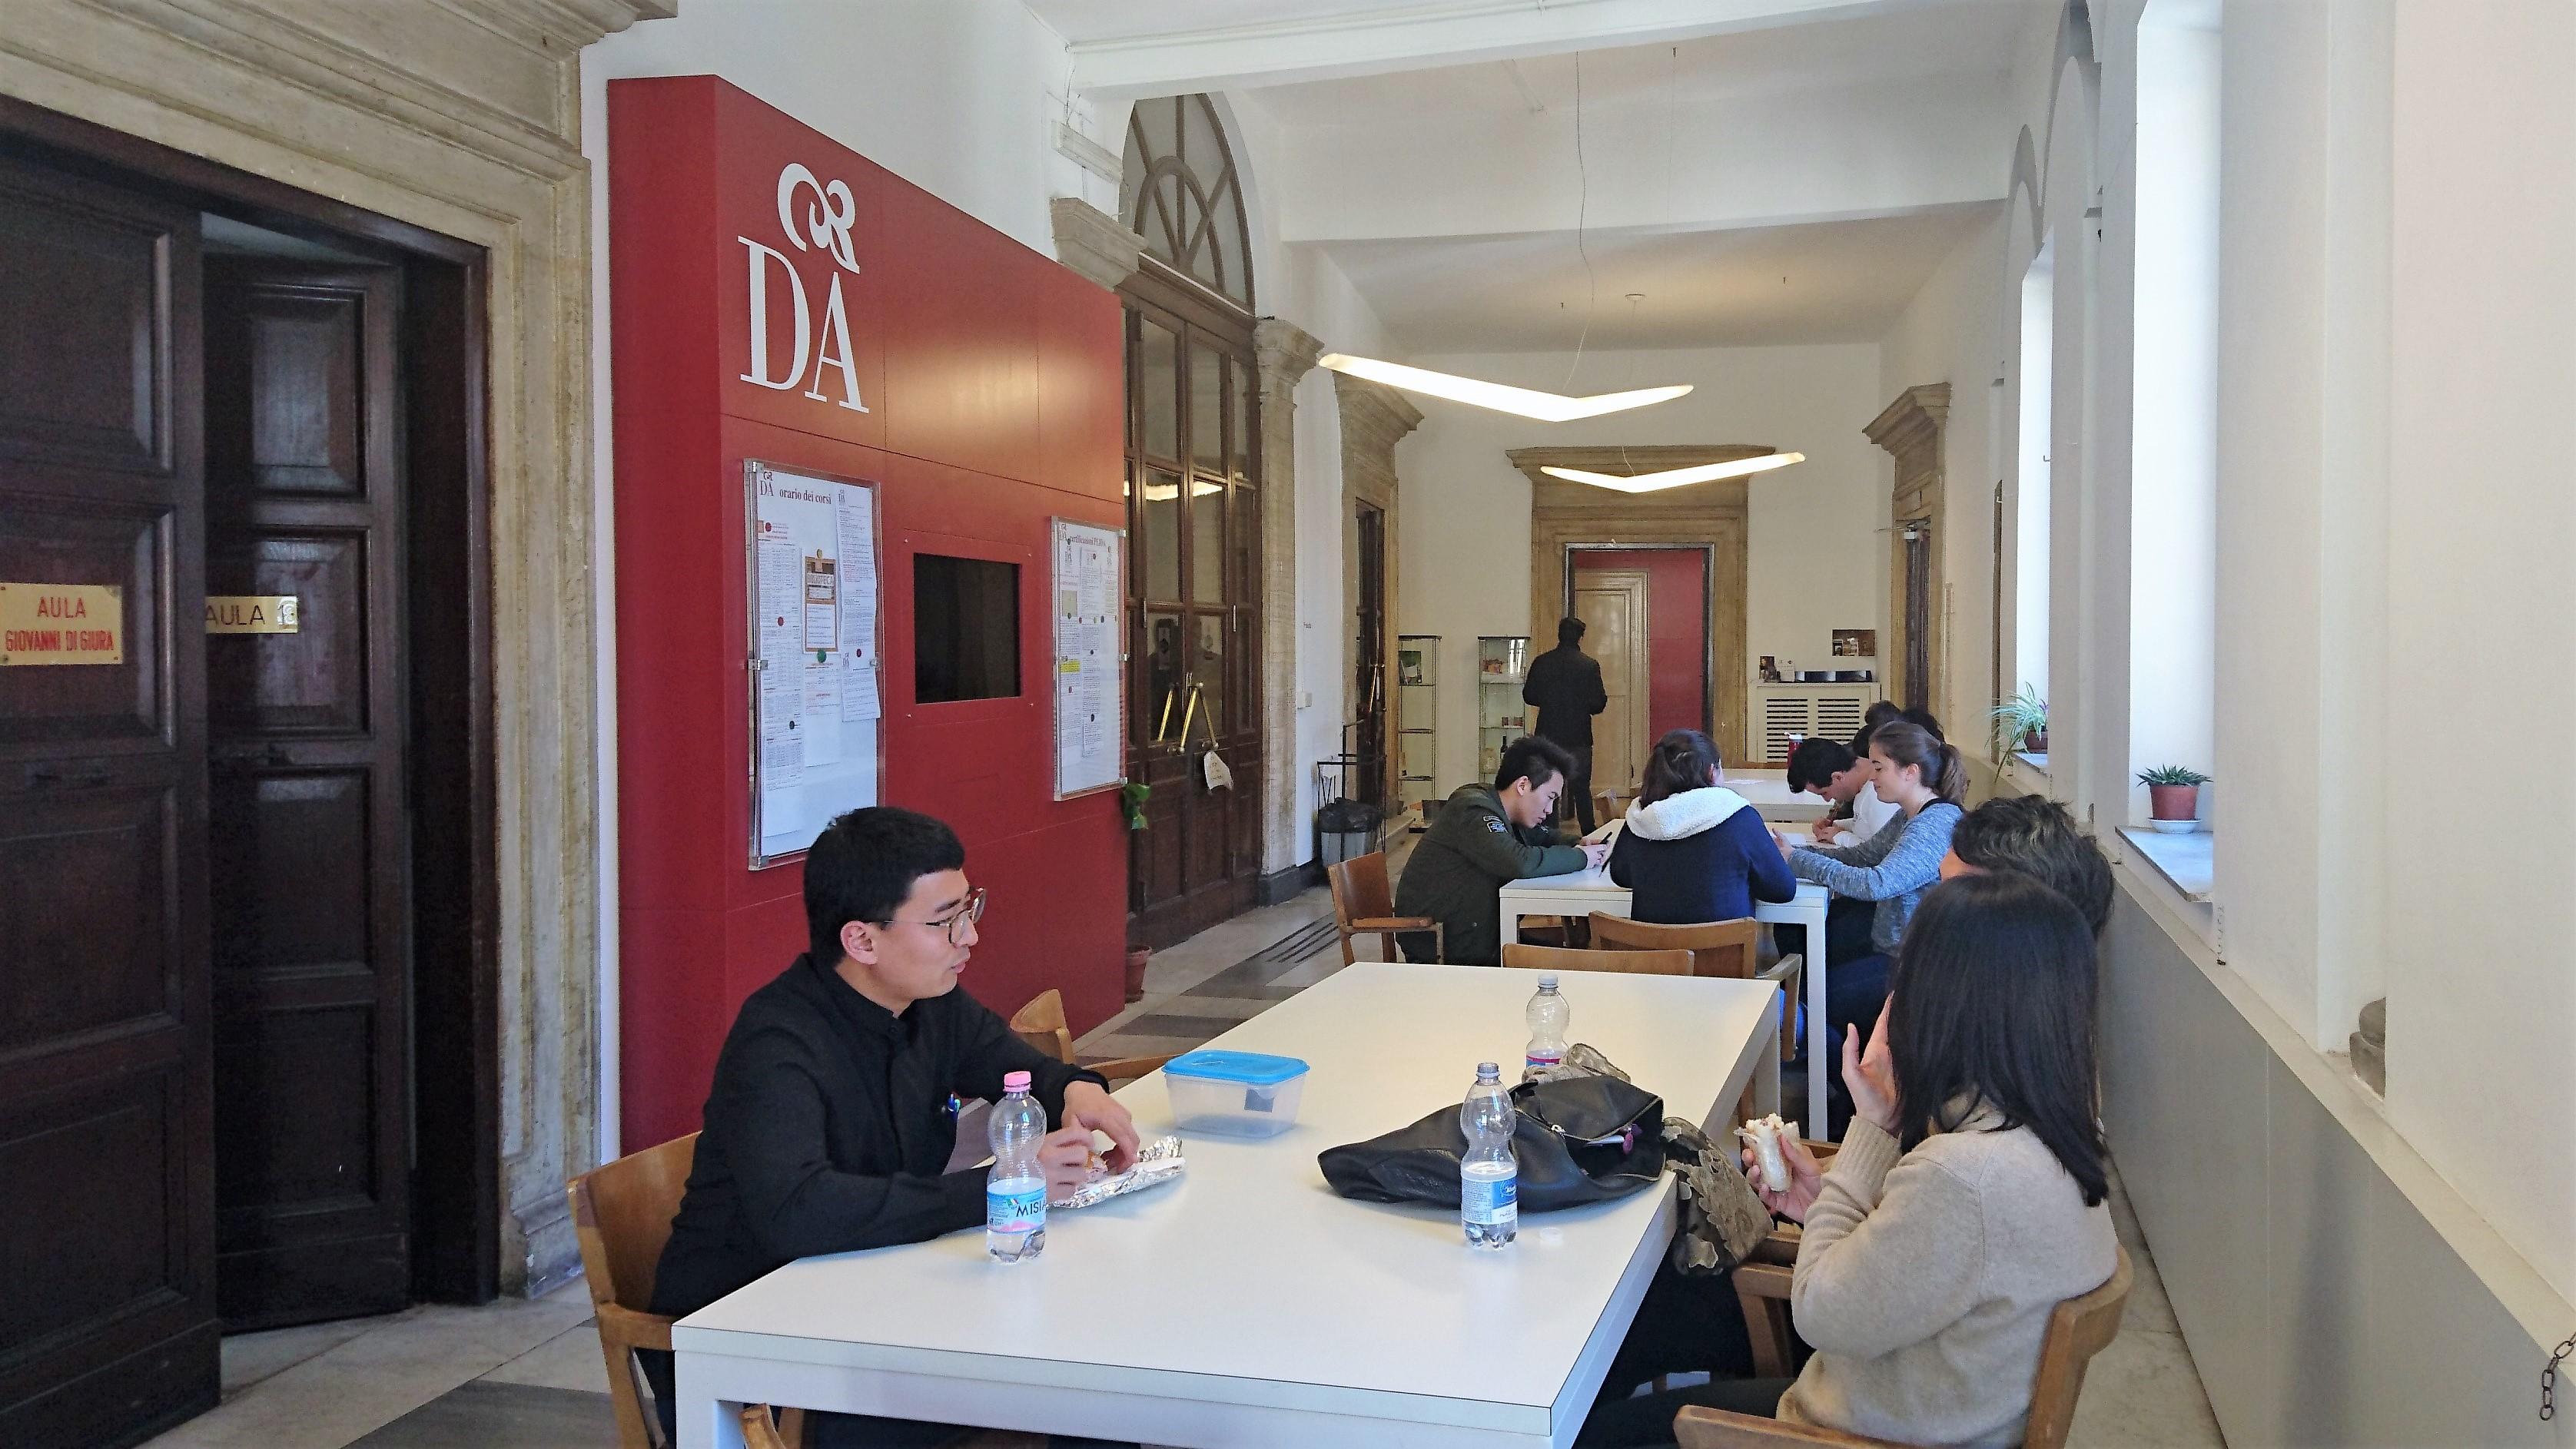 School Studioitalia Rome Italy